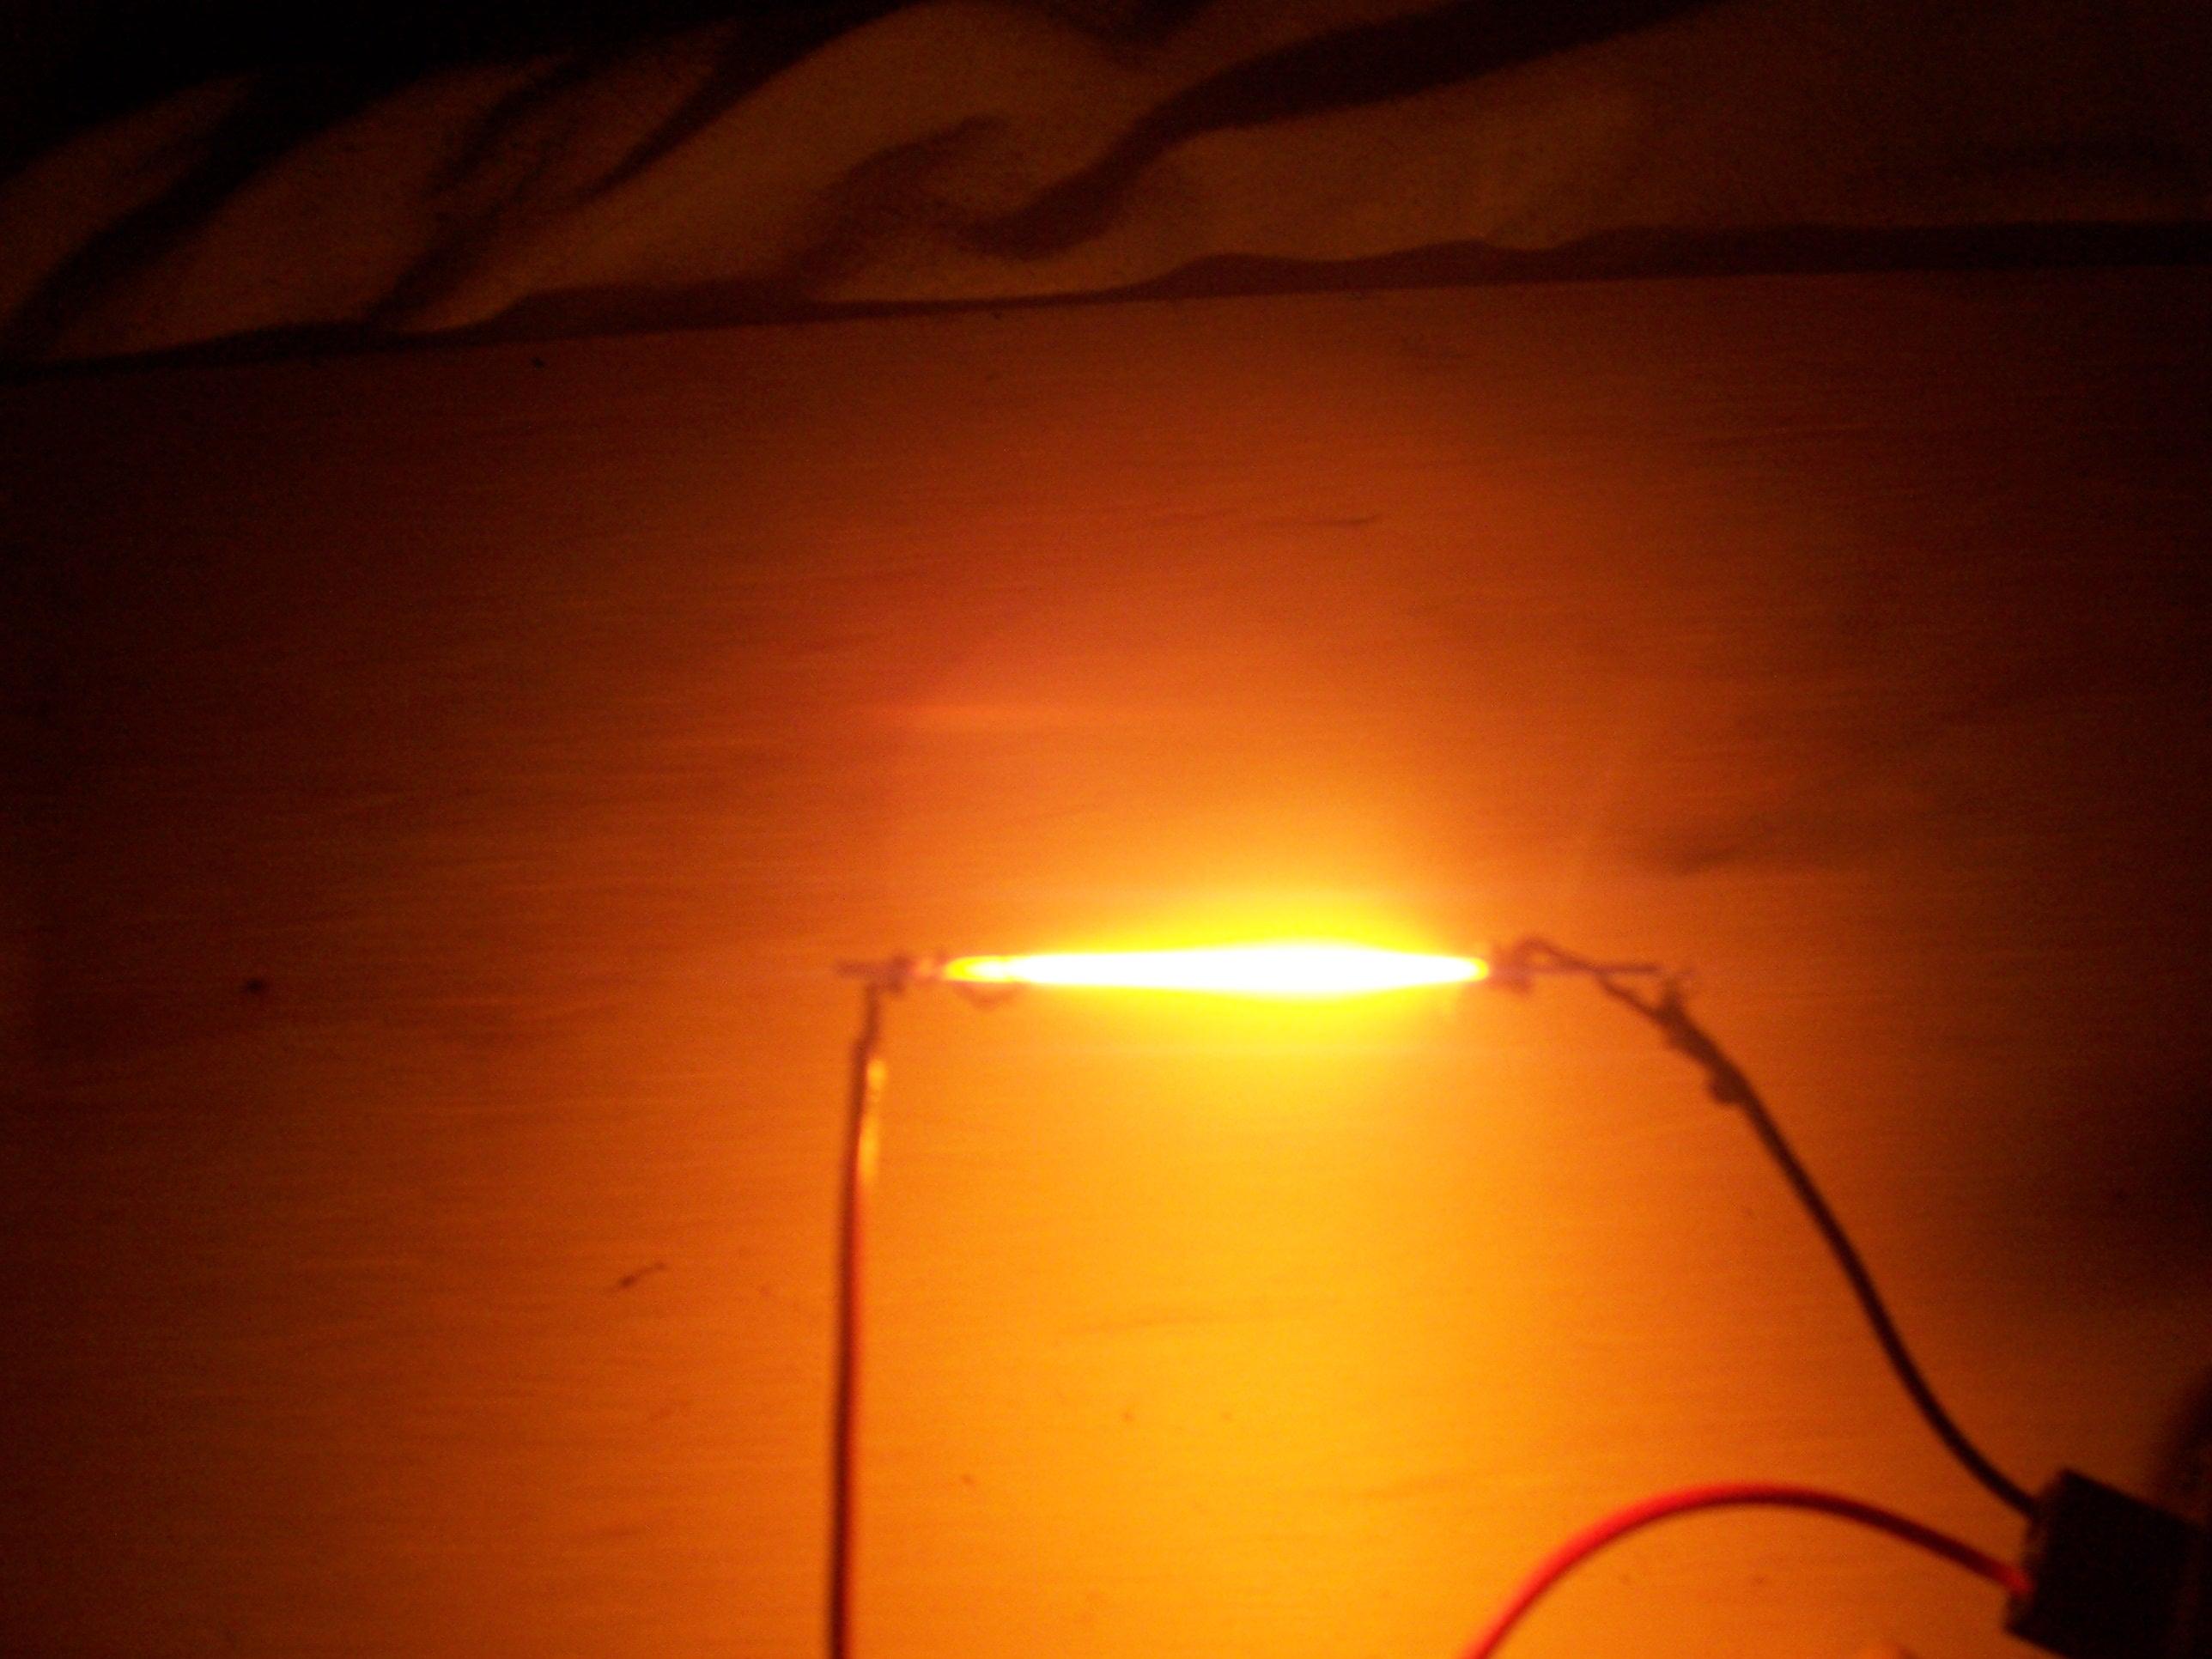 Lead light (Not a LED)